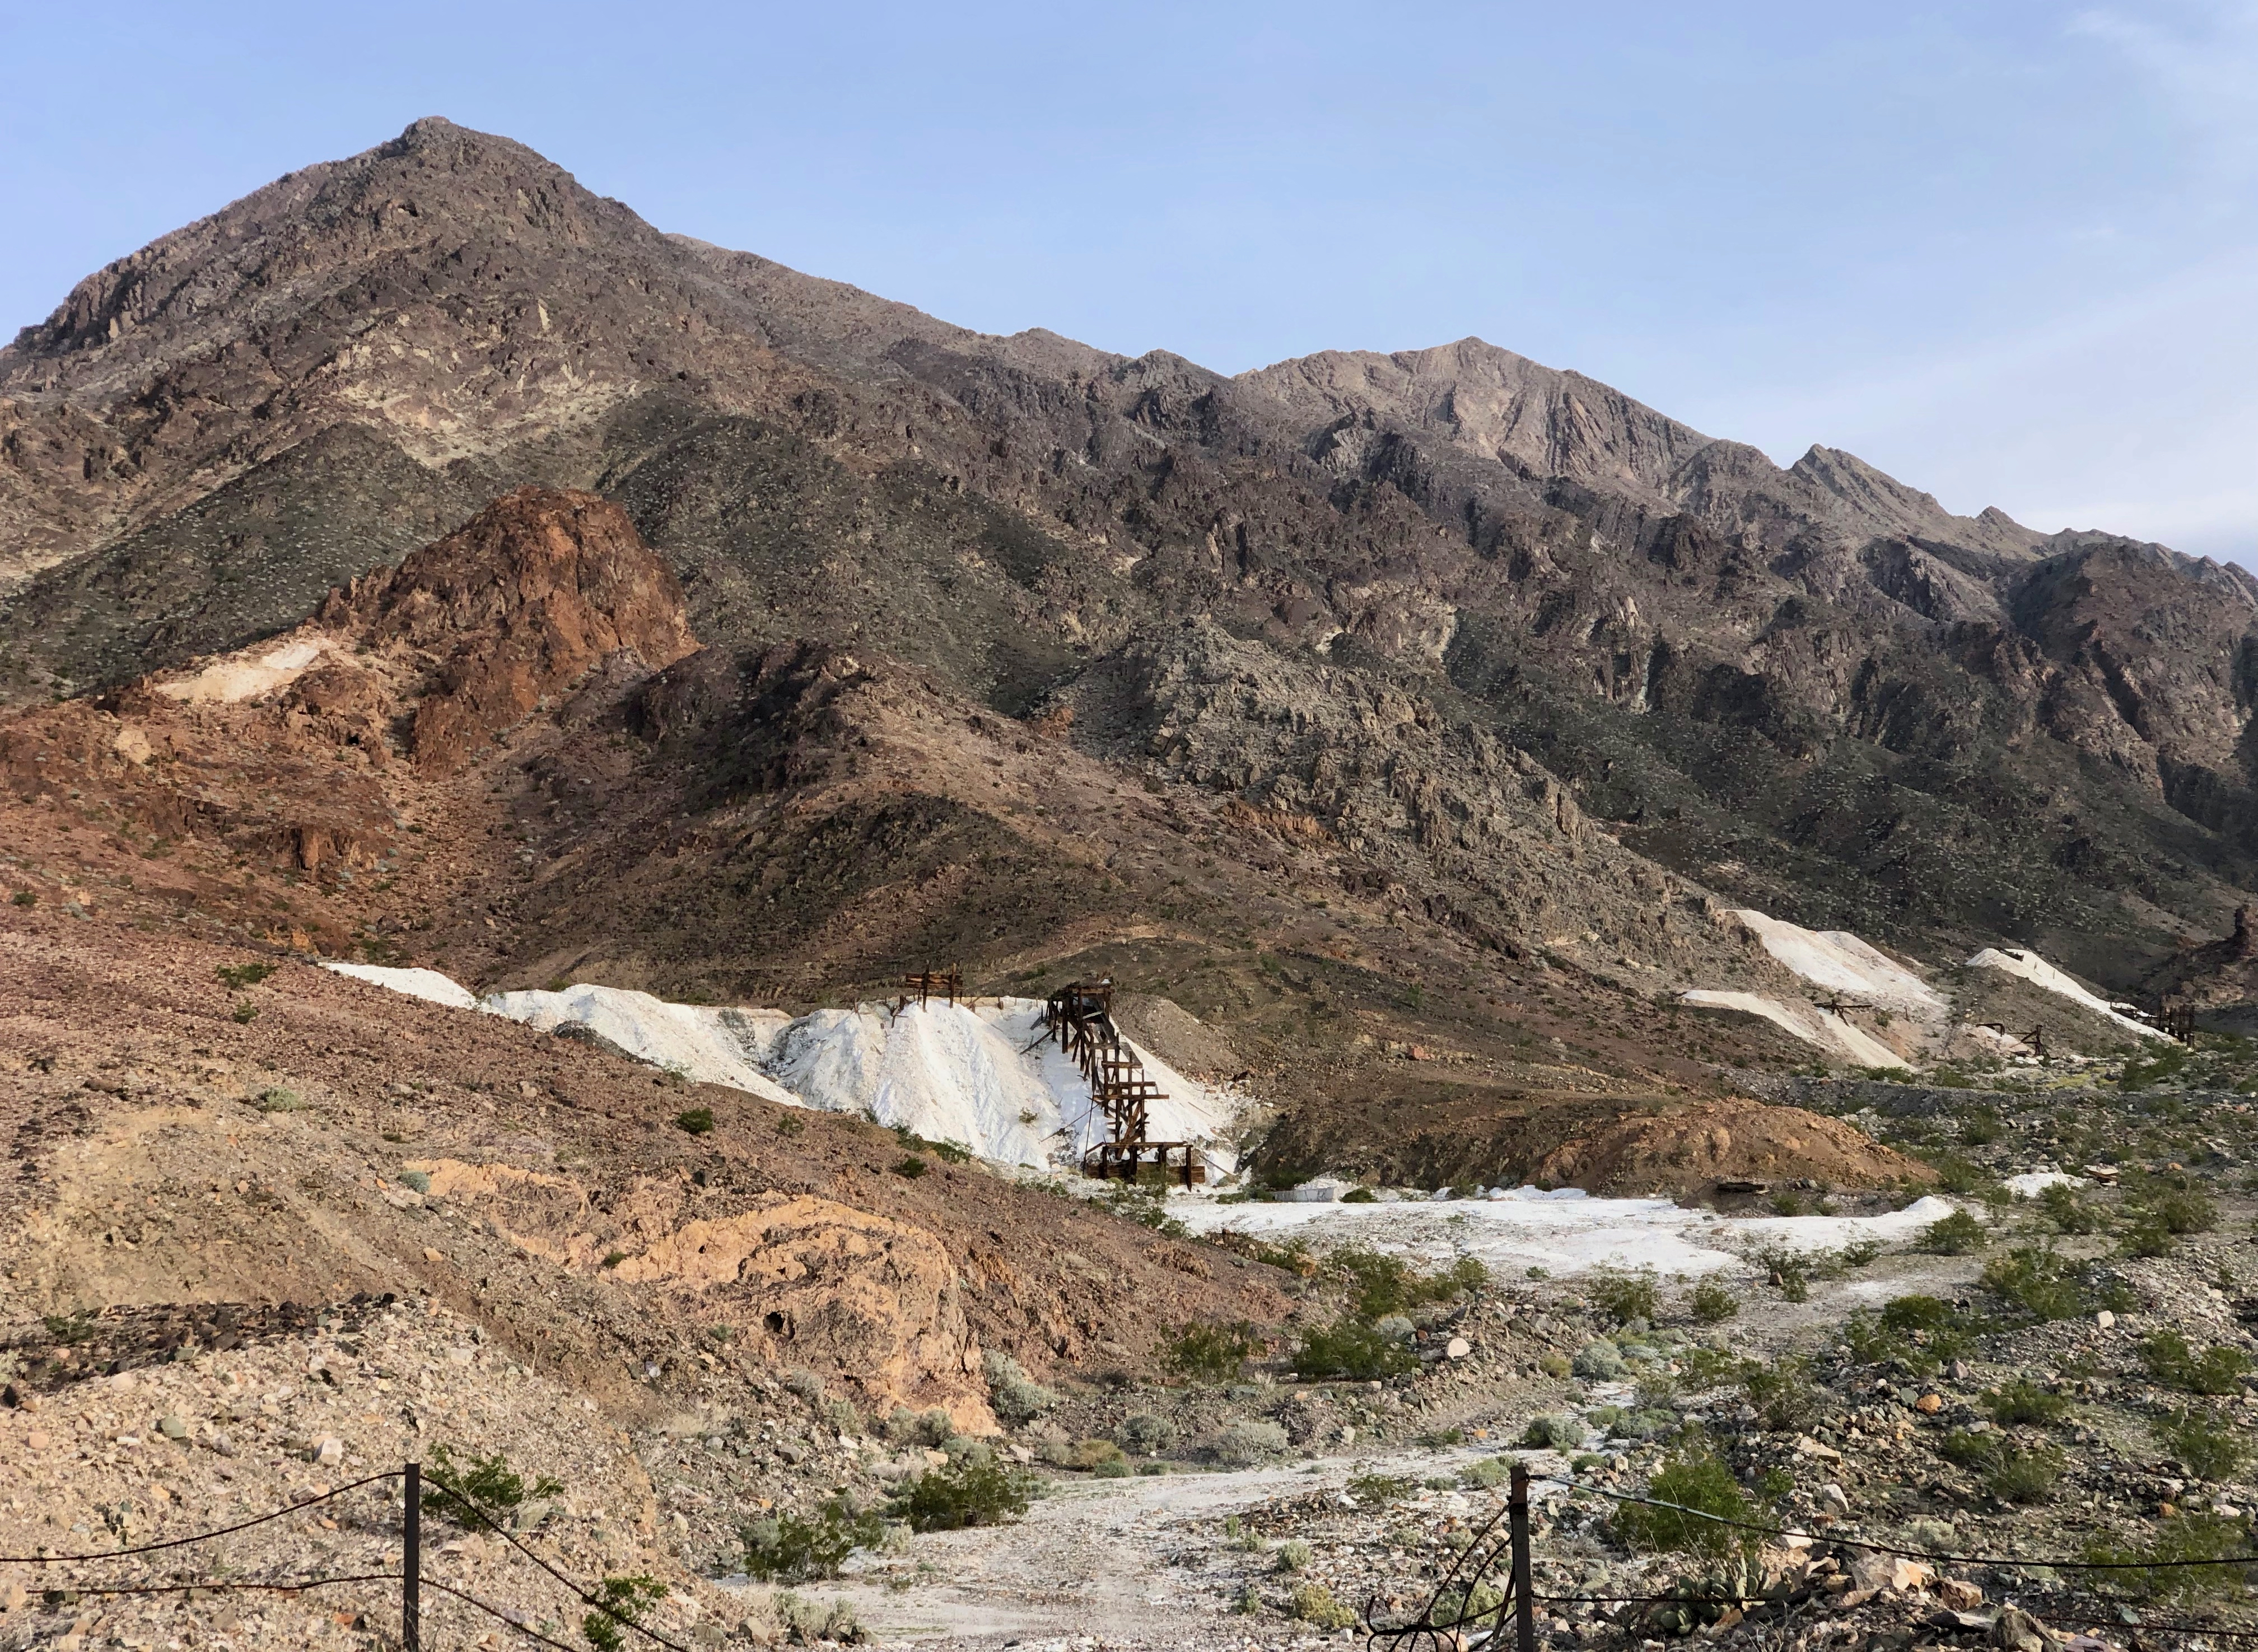 An abandoned borax mine